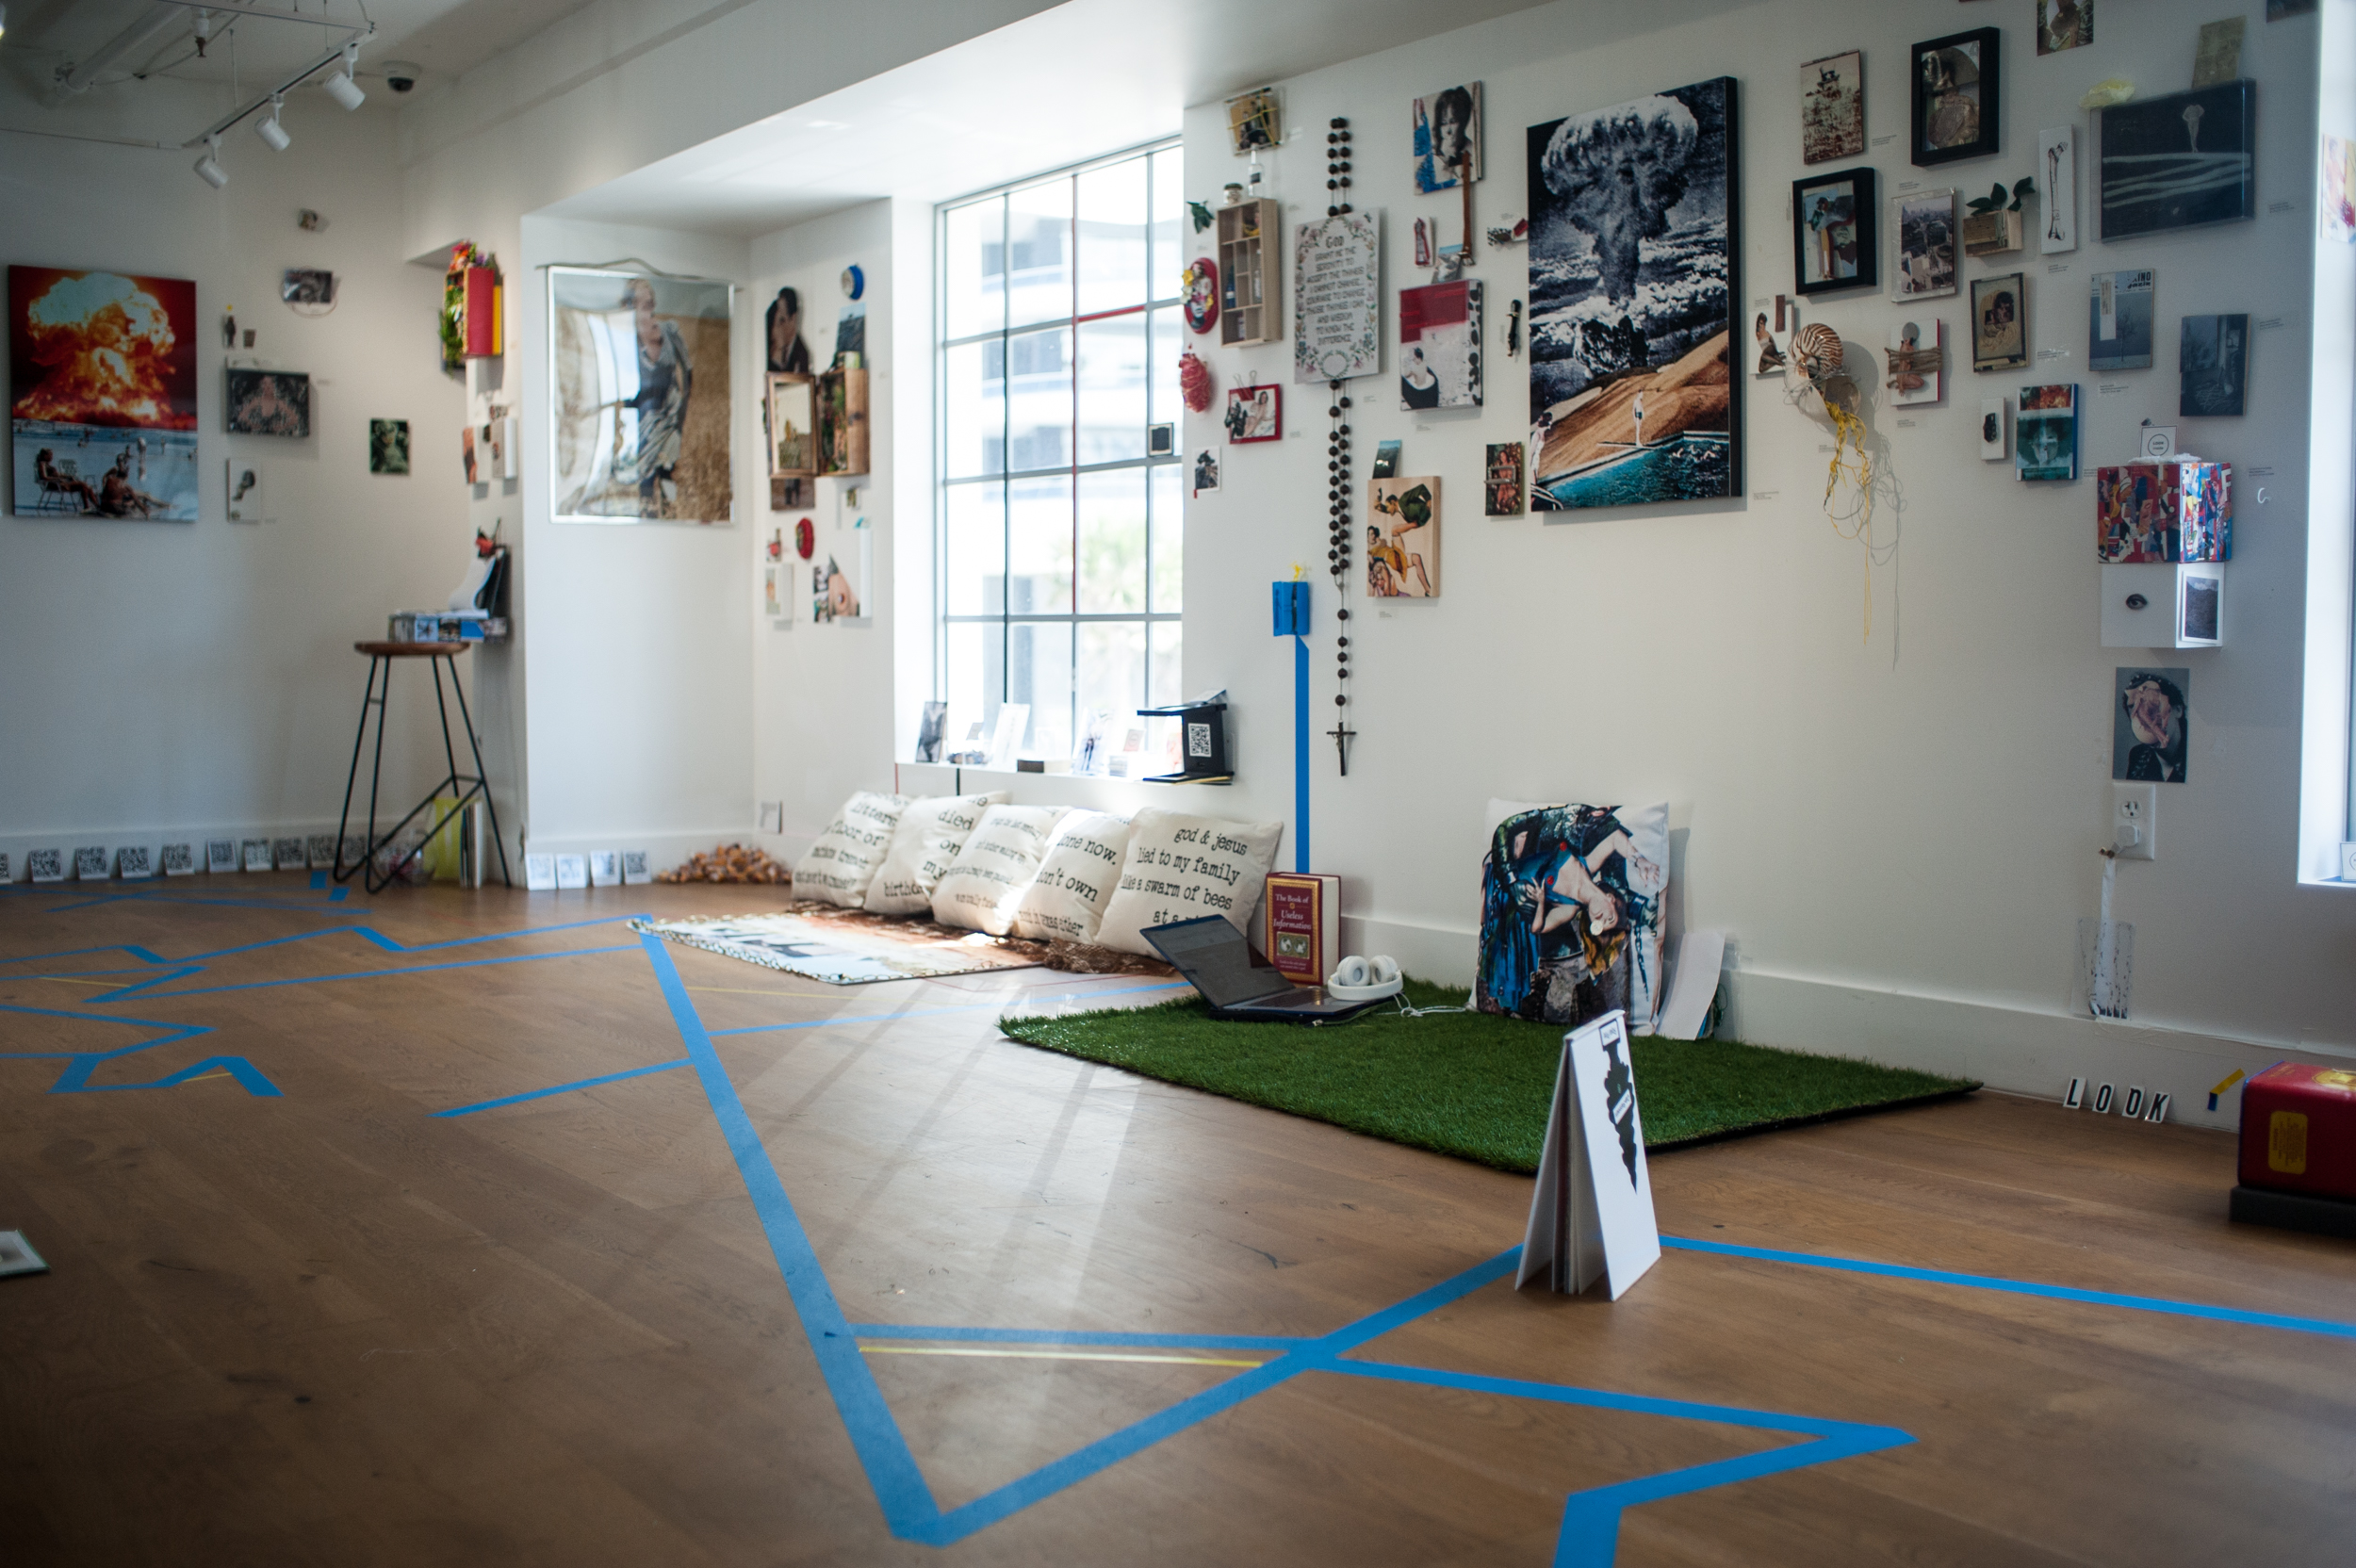 Faena-Exhibition-Images-62.jpg